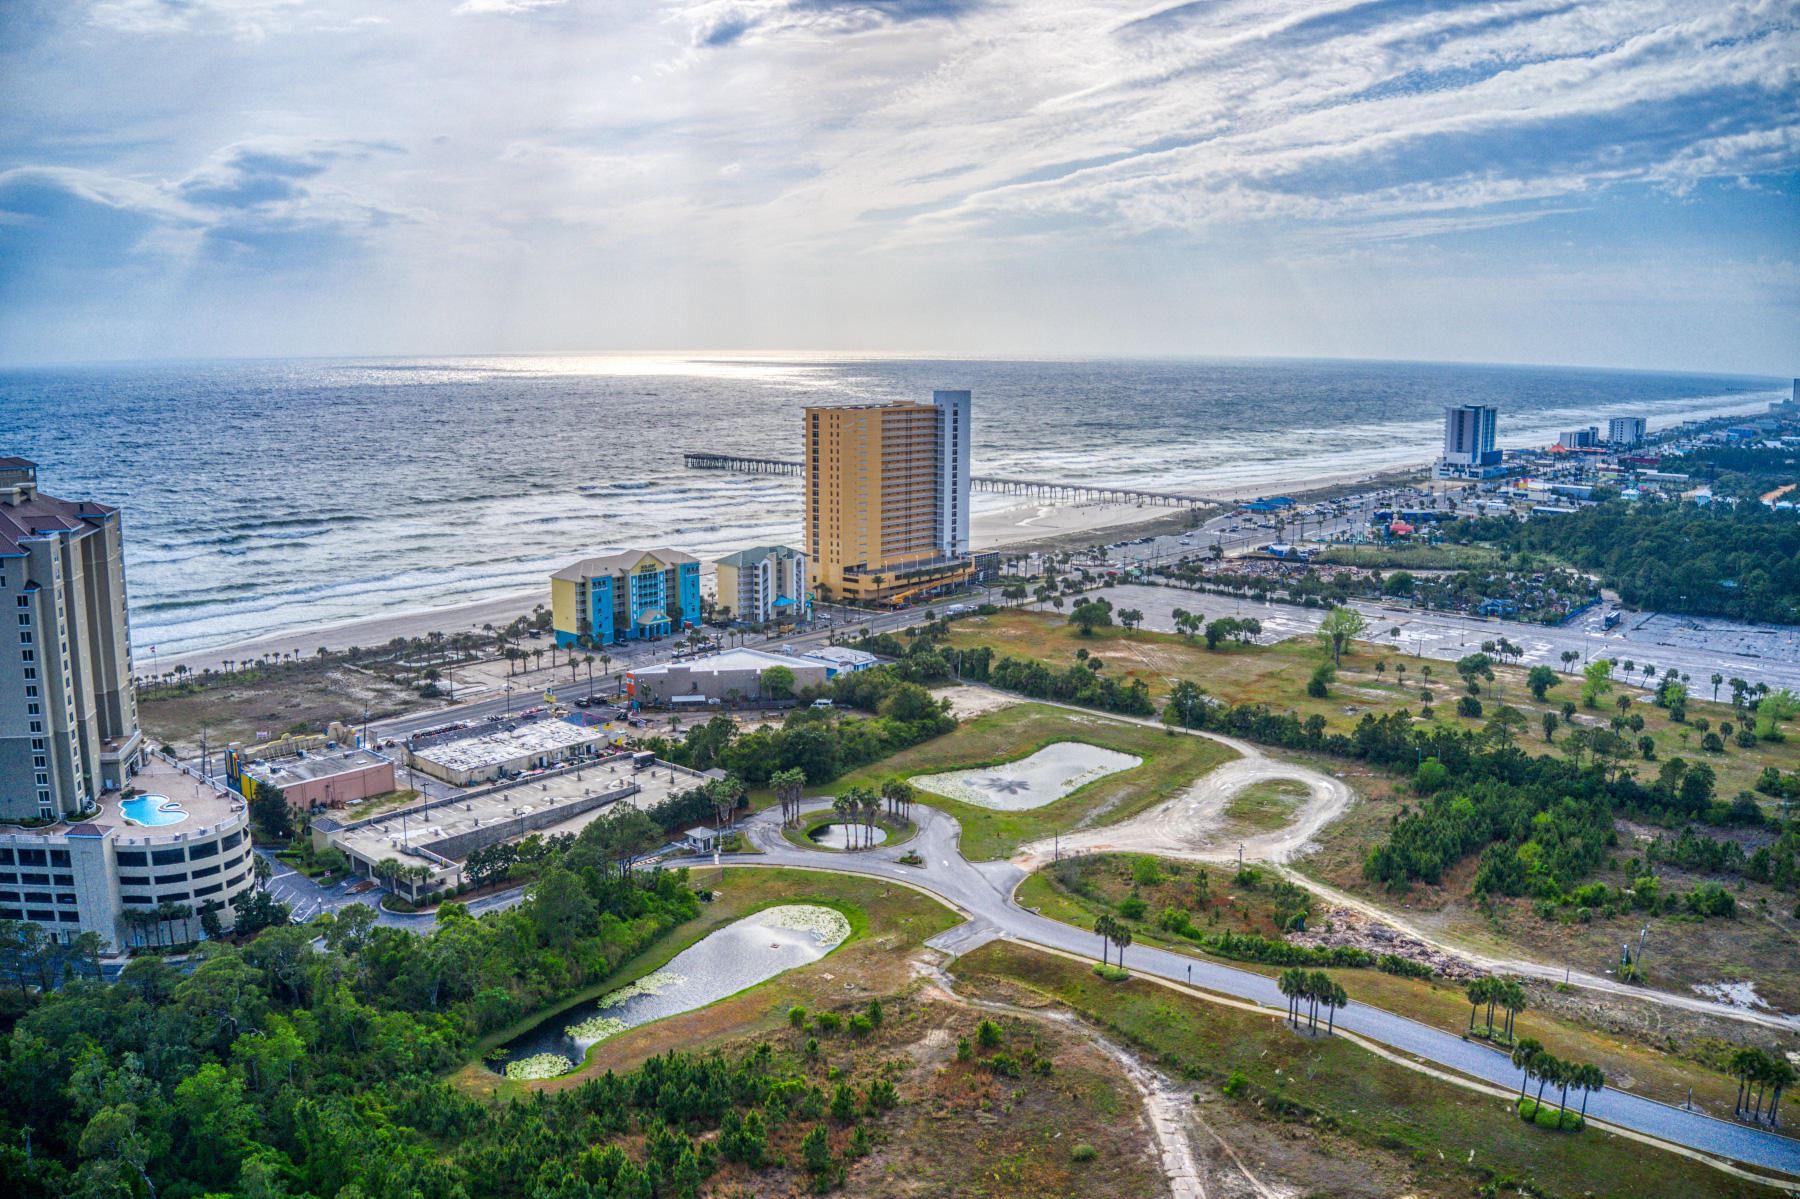 520 Richard Jackson Boulevard #3006, Panama City Beach, FL 32407 - #: 843831